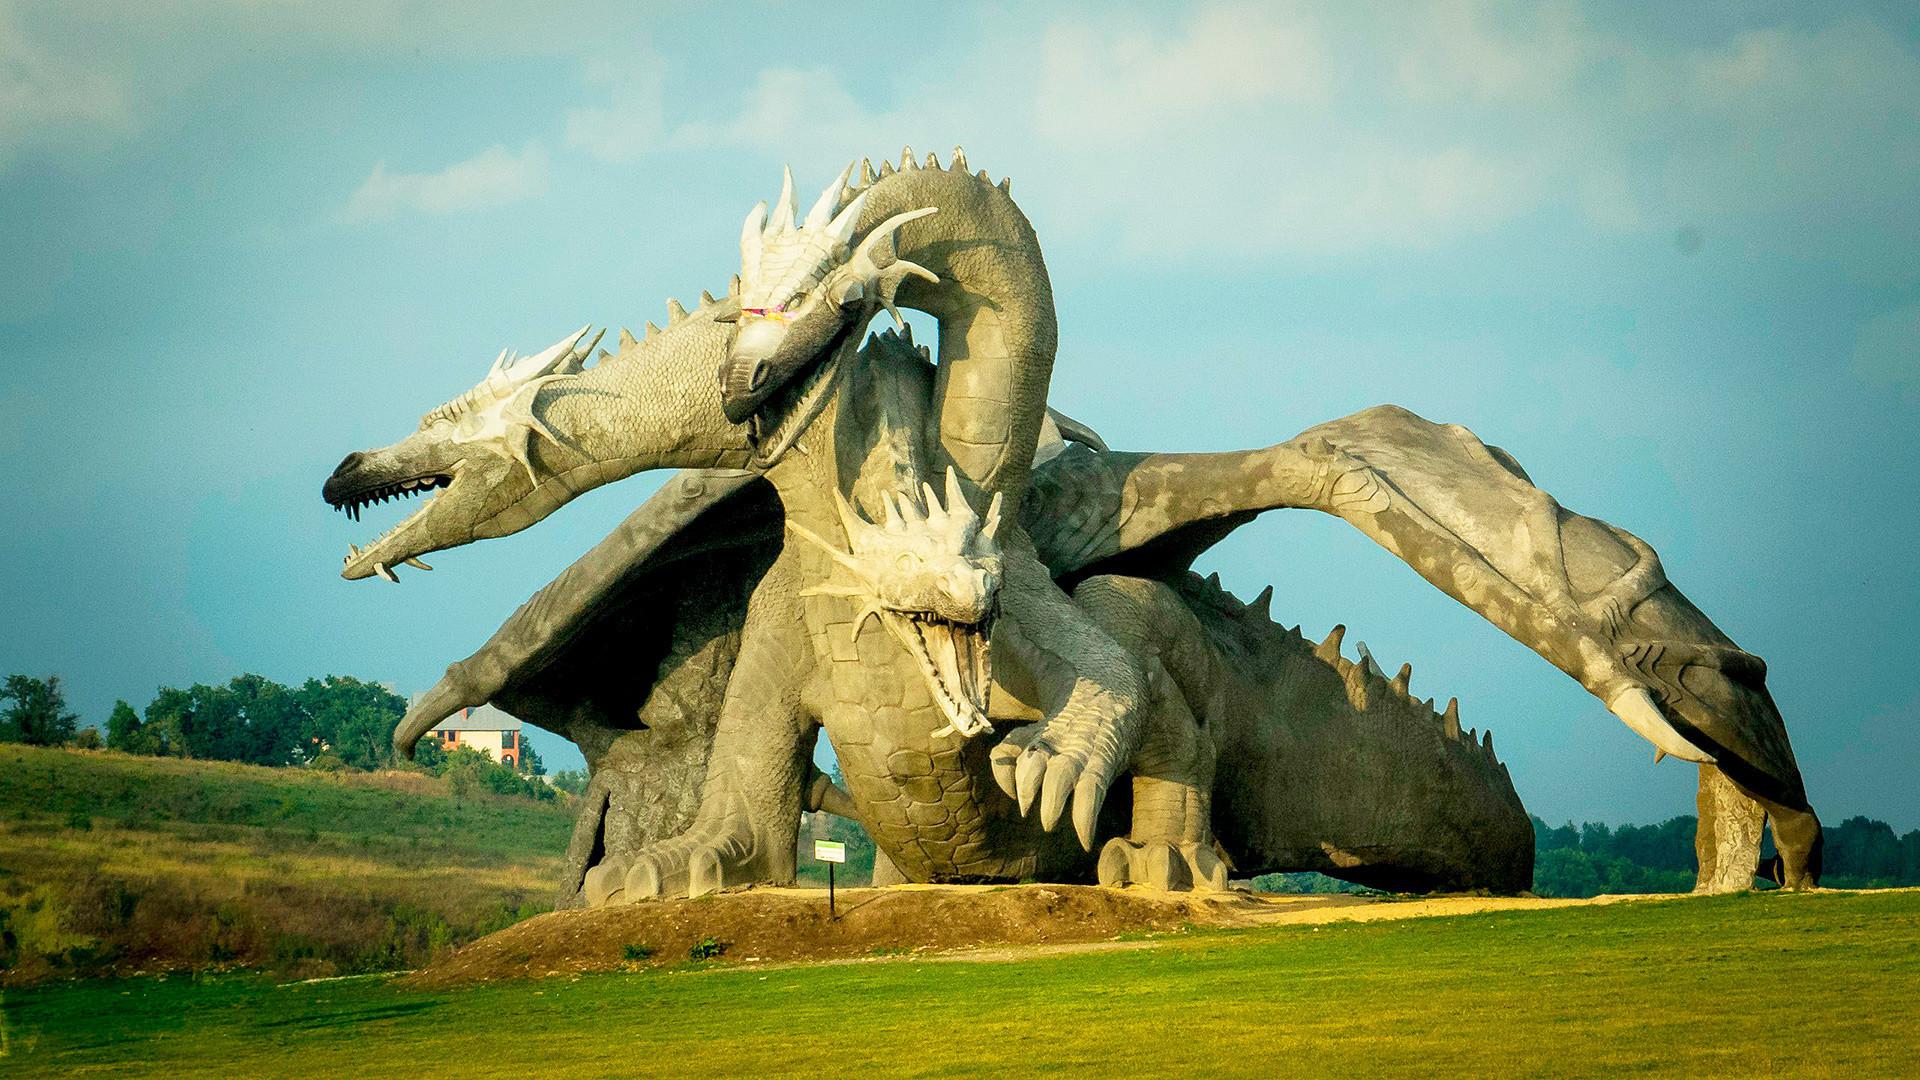 Patung raksasa Zmey di Oblast Lipetskaya.